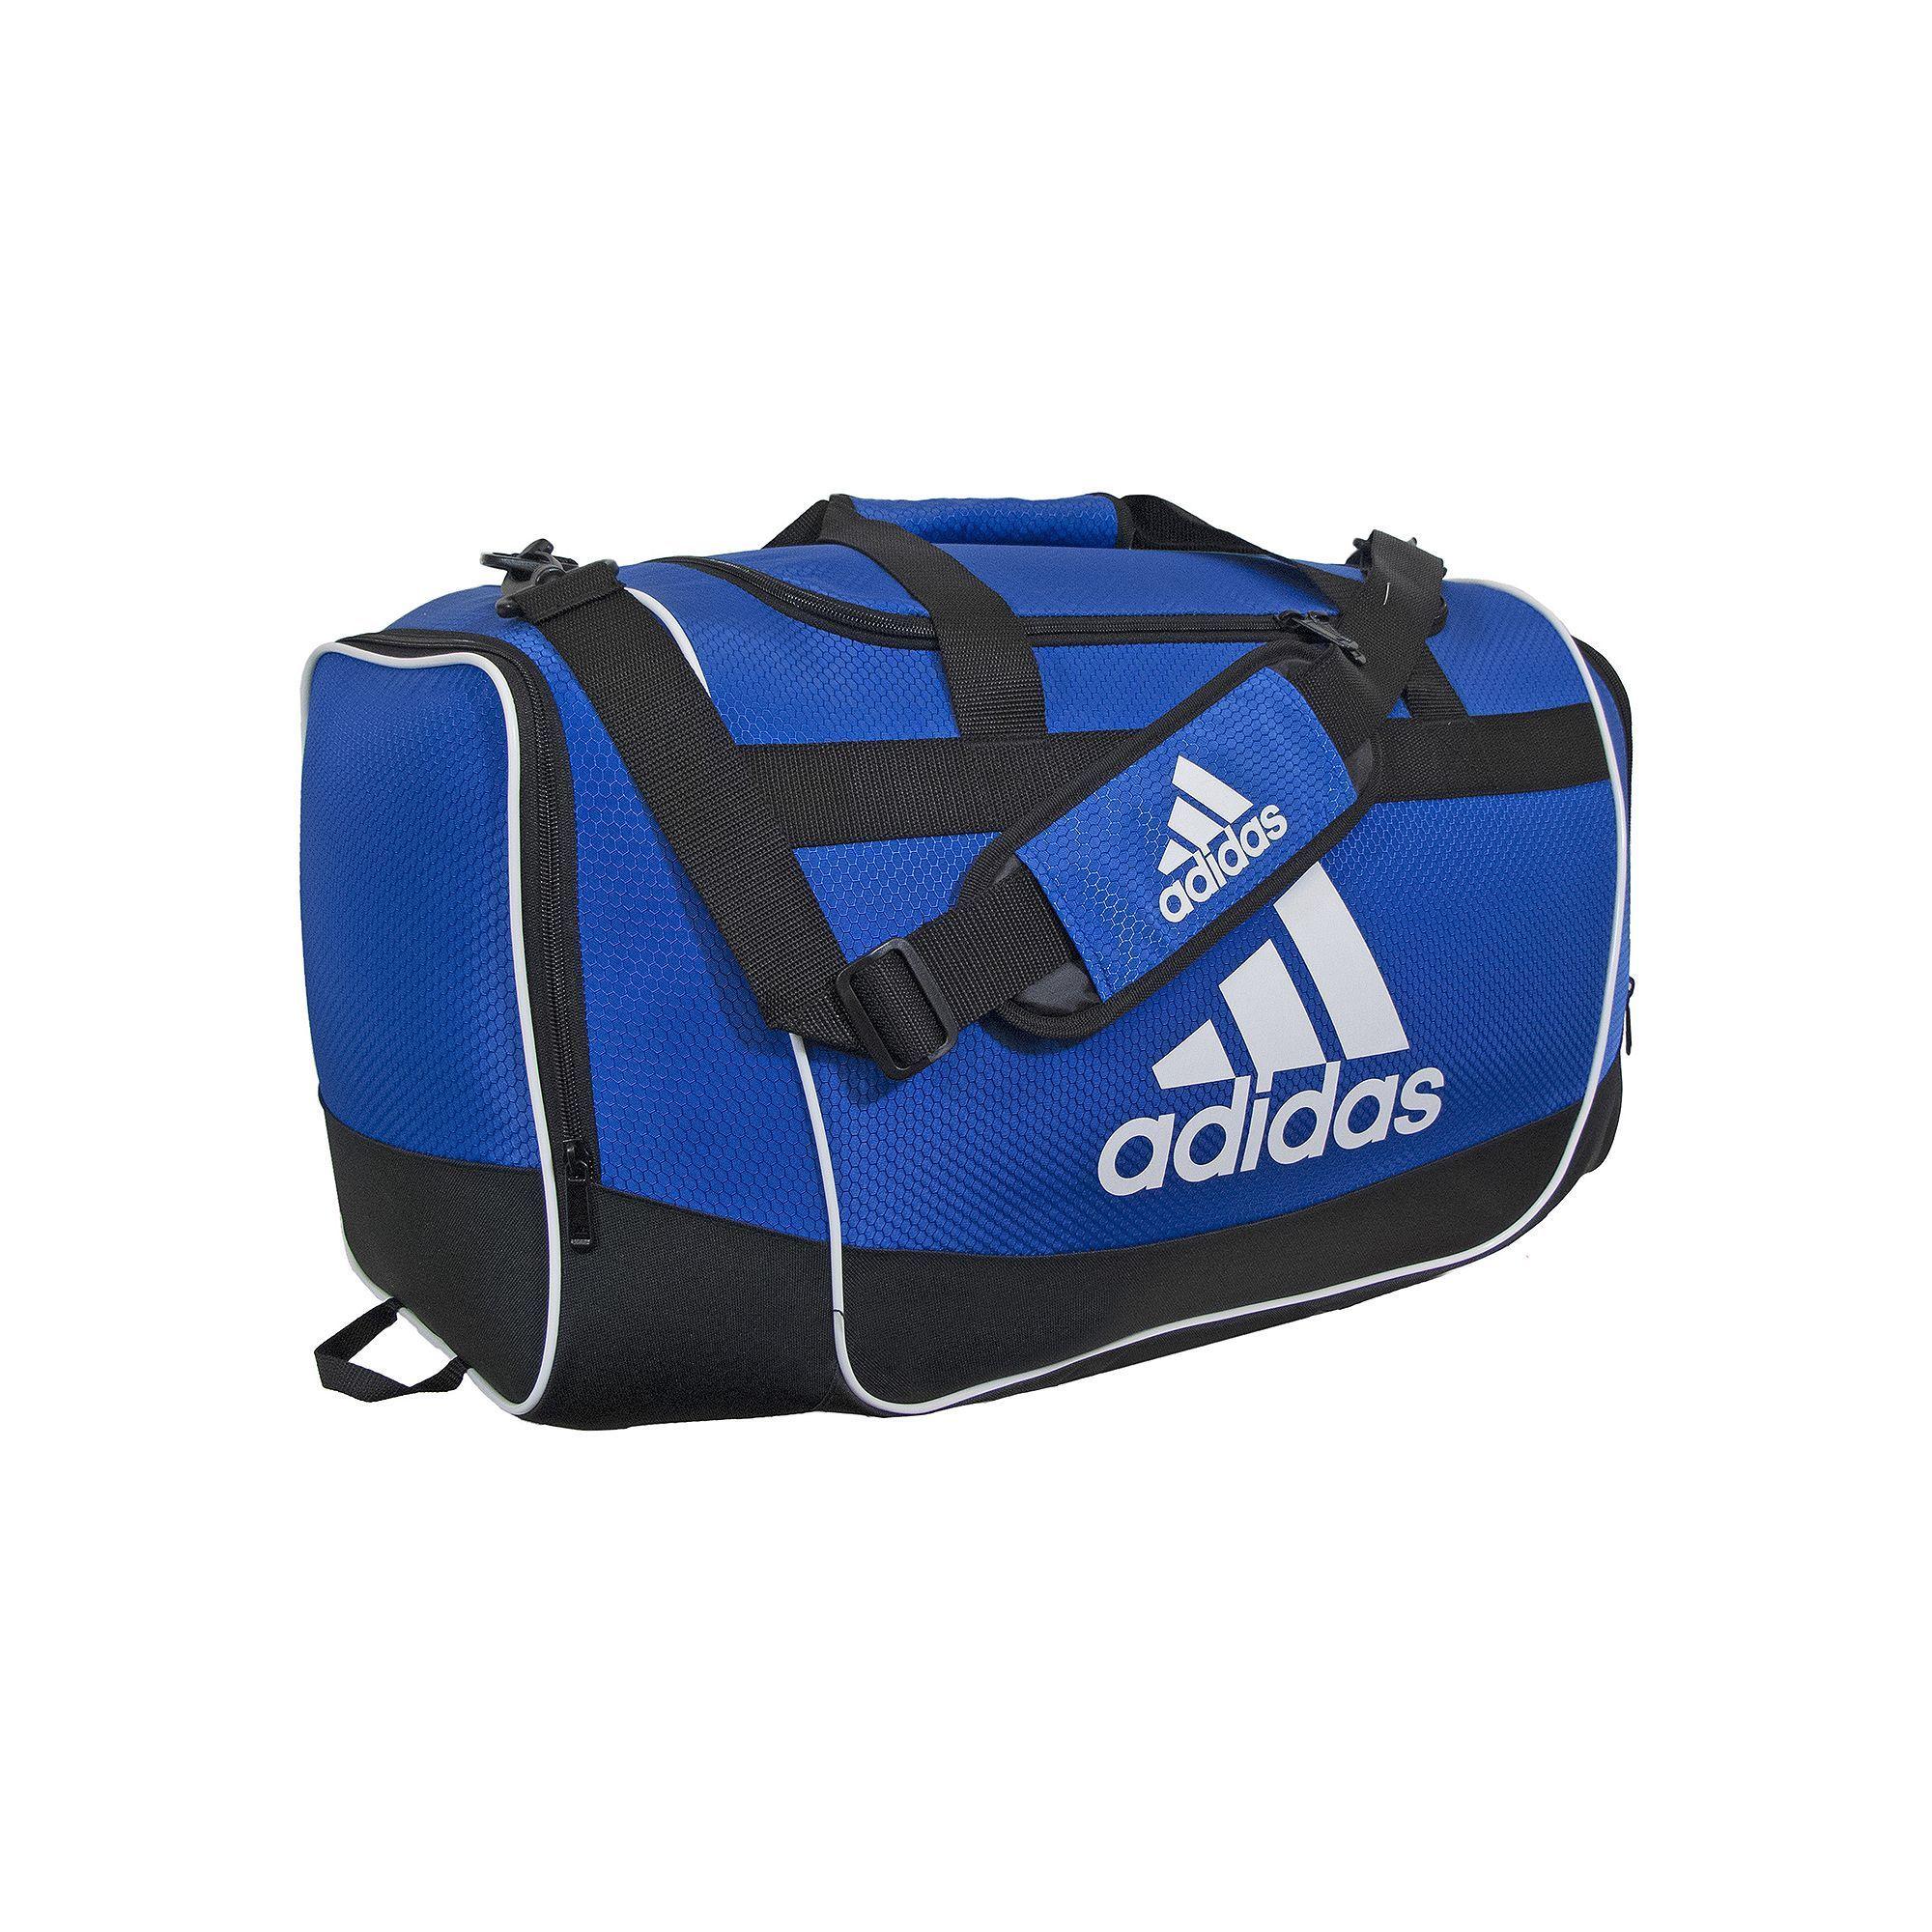 37922df54c92 Adidas Defender II Duffel Bag - Medium